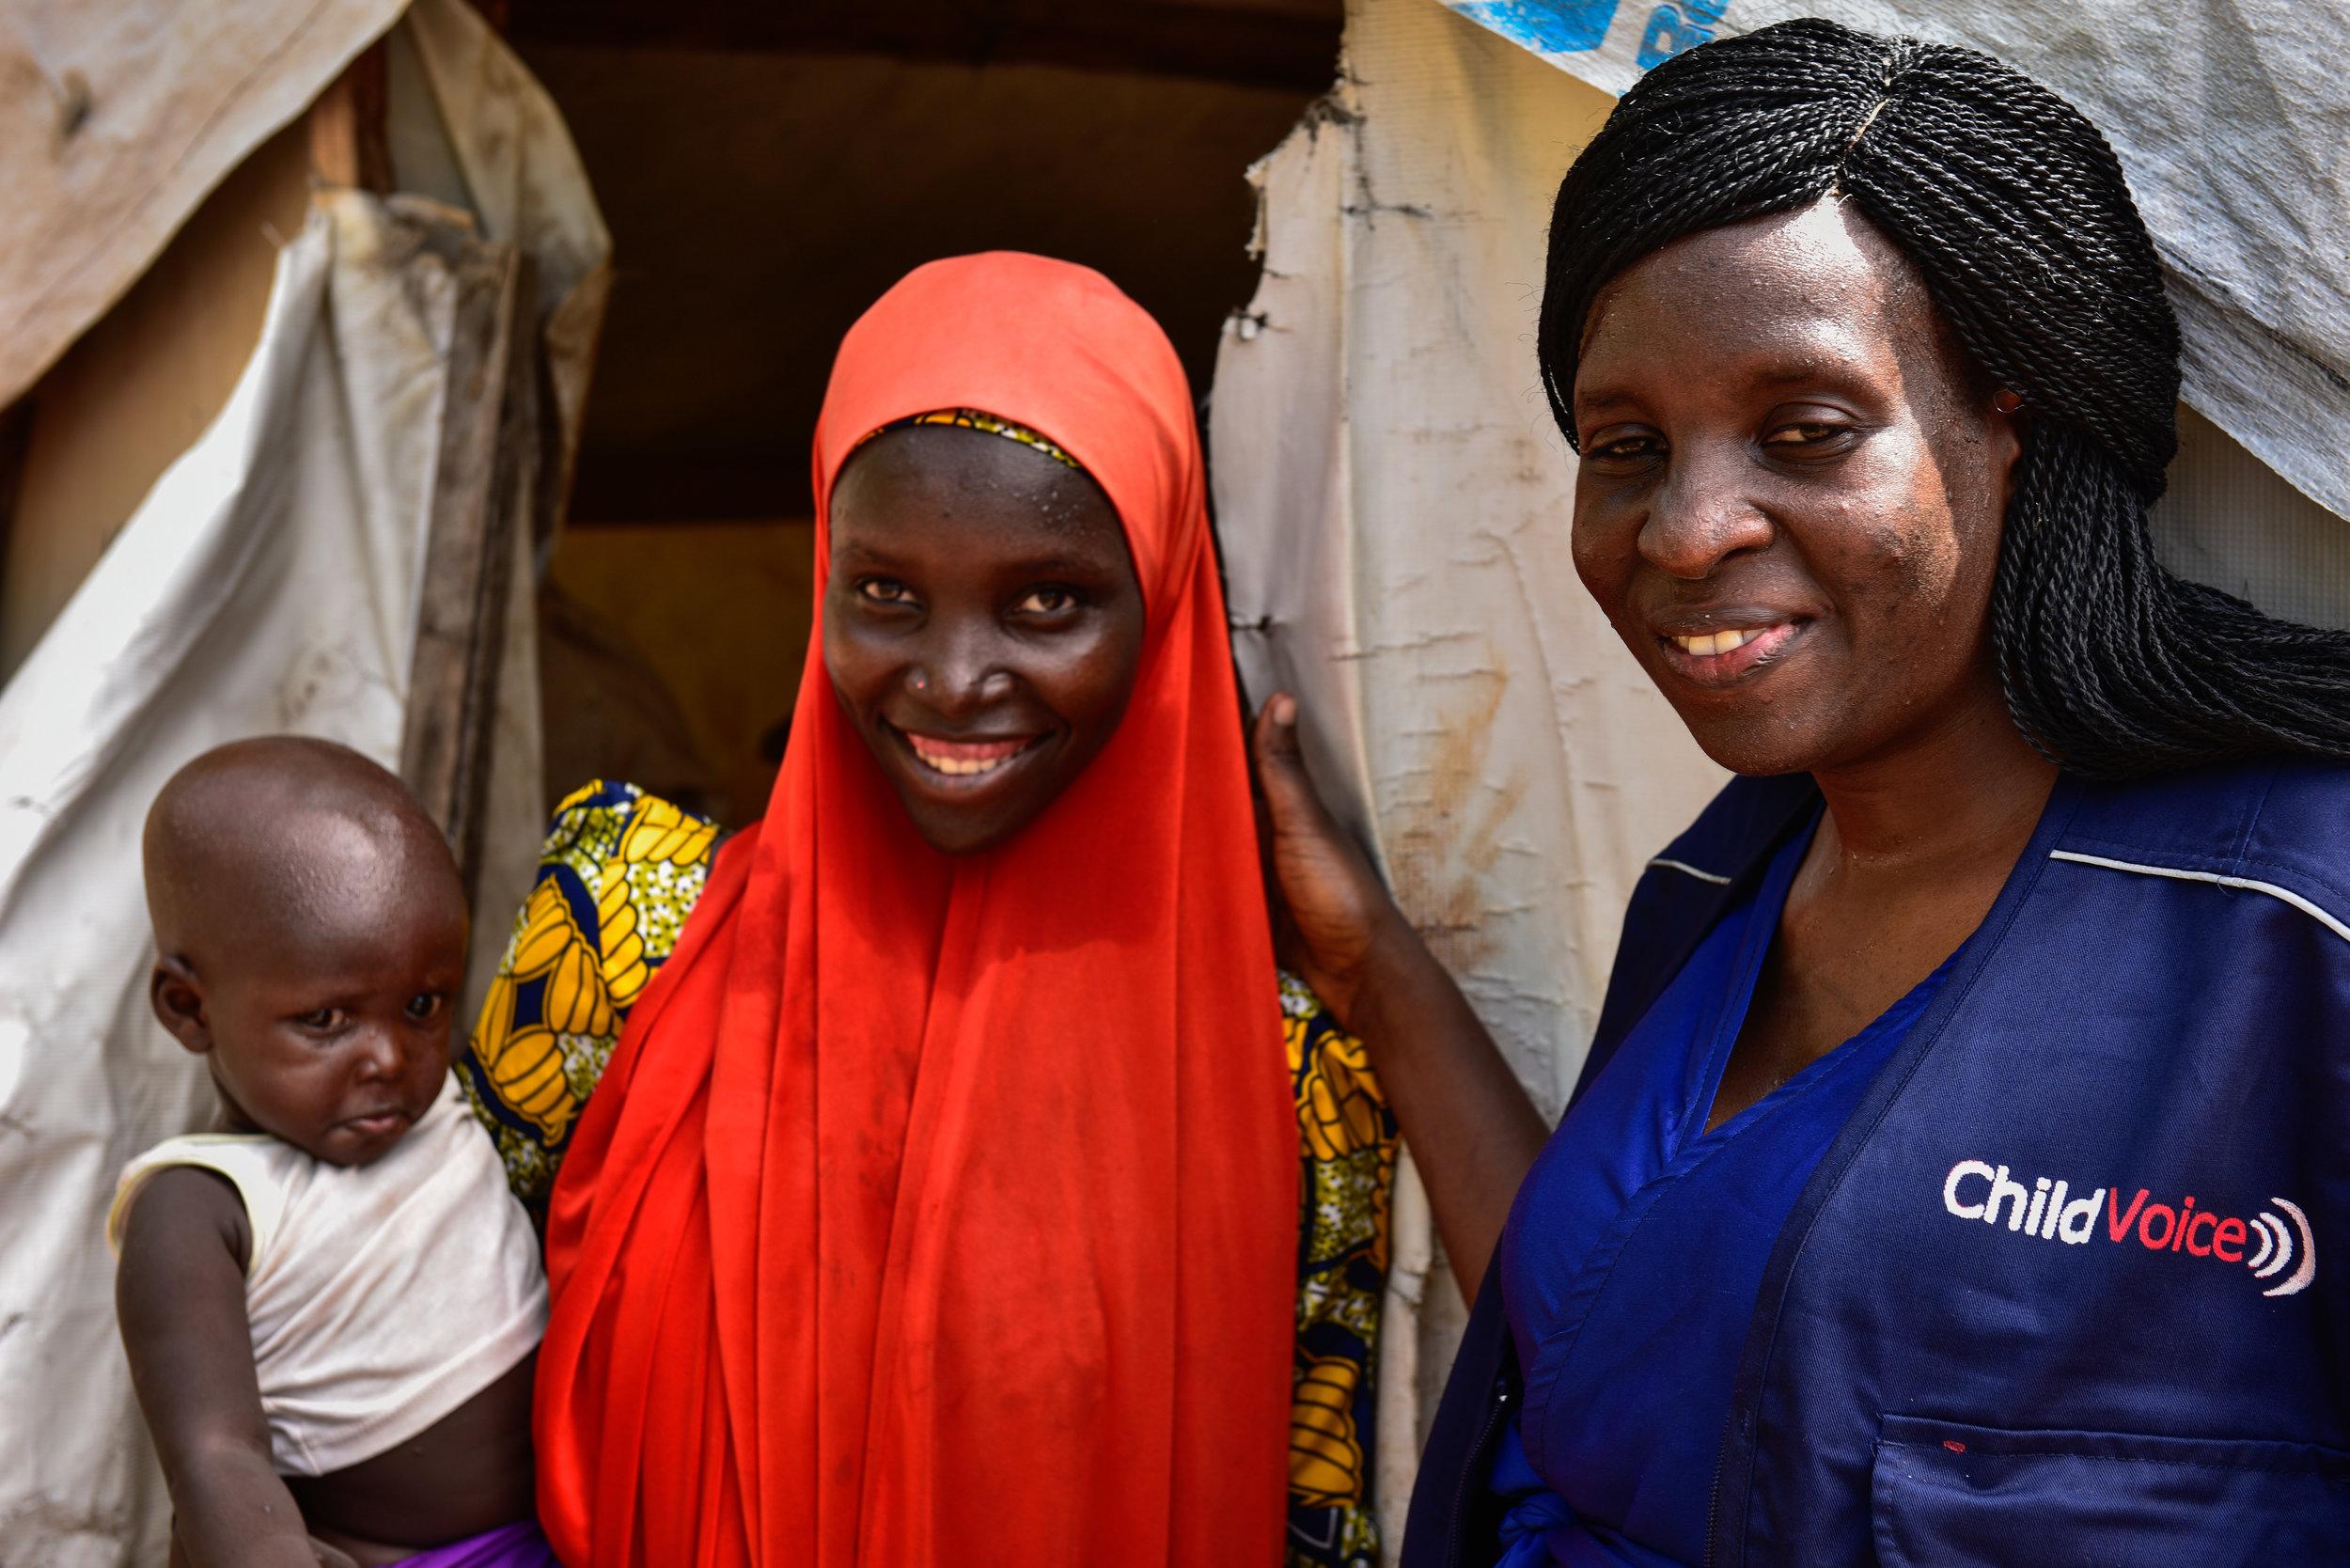 Fatima and her child with ChildVoice staff member Rebecca